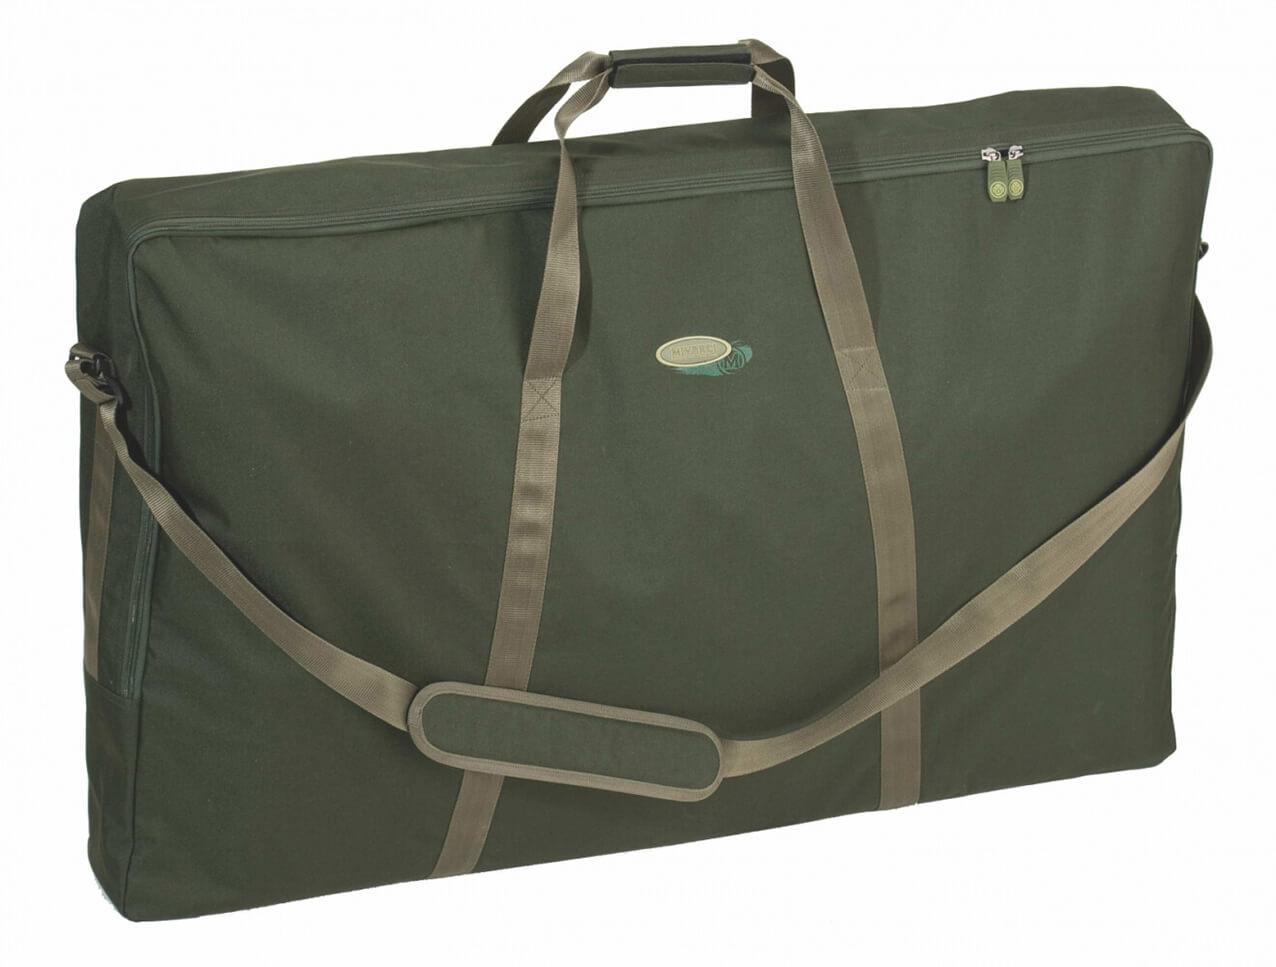 Prepravná taška MIVARDI na kreslá Comfort / Comfort Quattro.